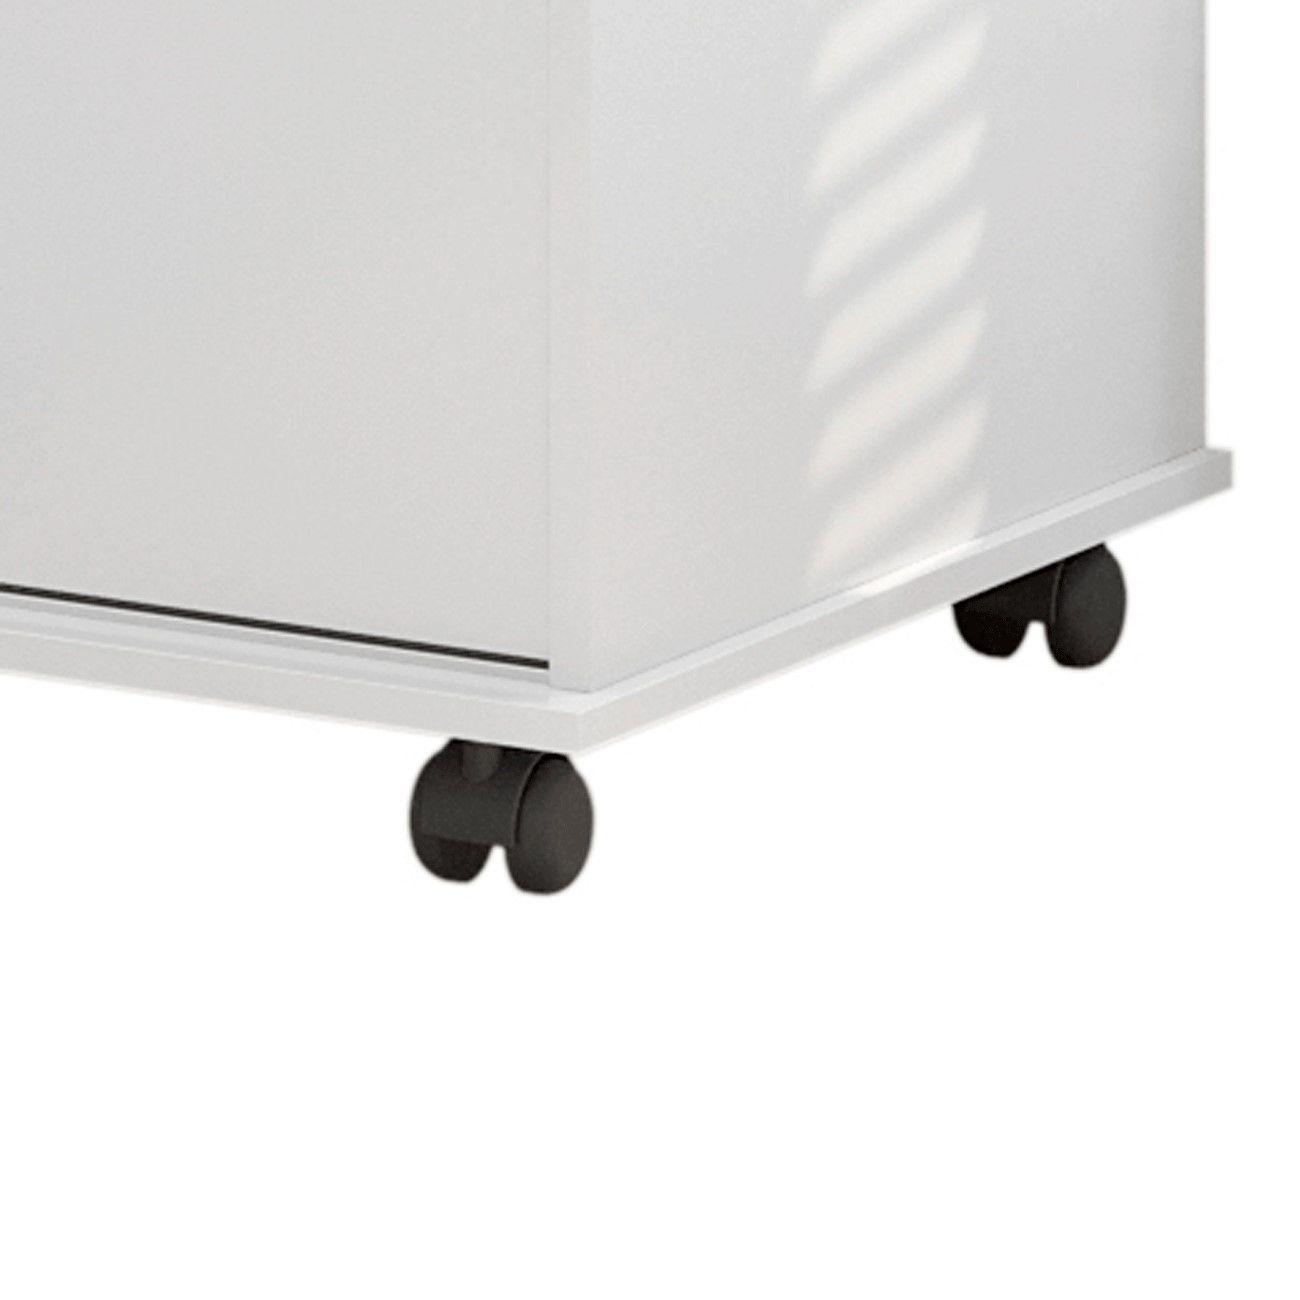 Cômoda Max 2020 6 Gavetas Branco Brilho